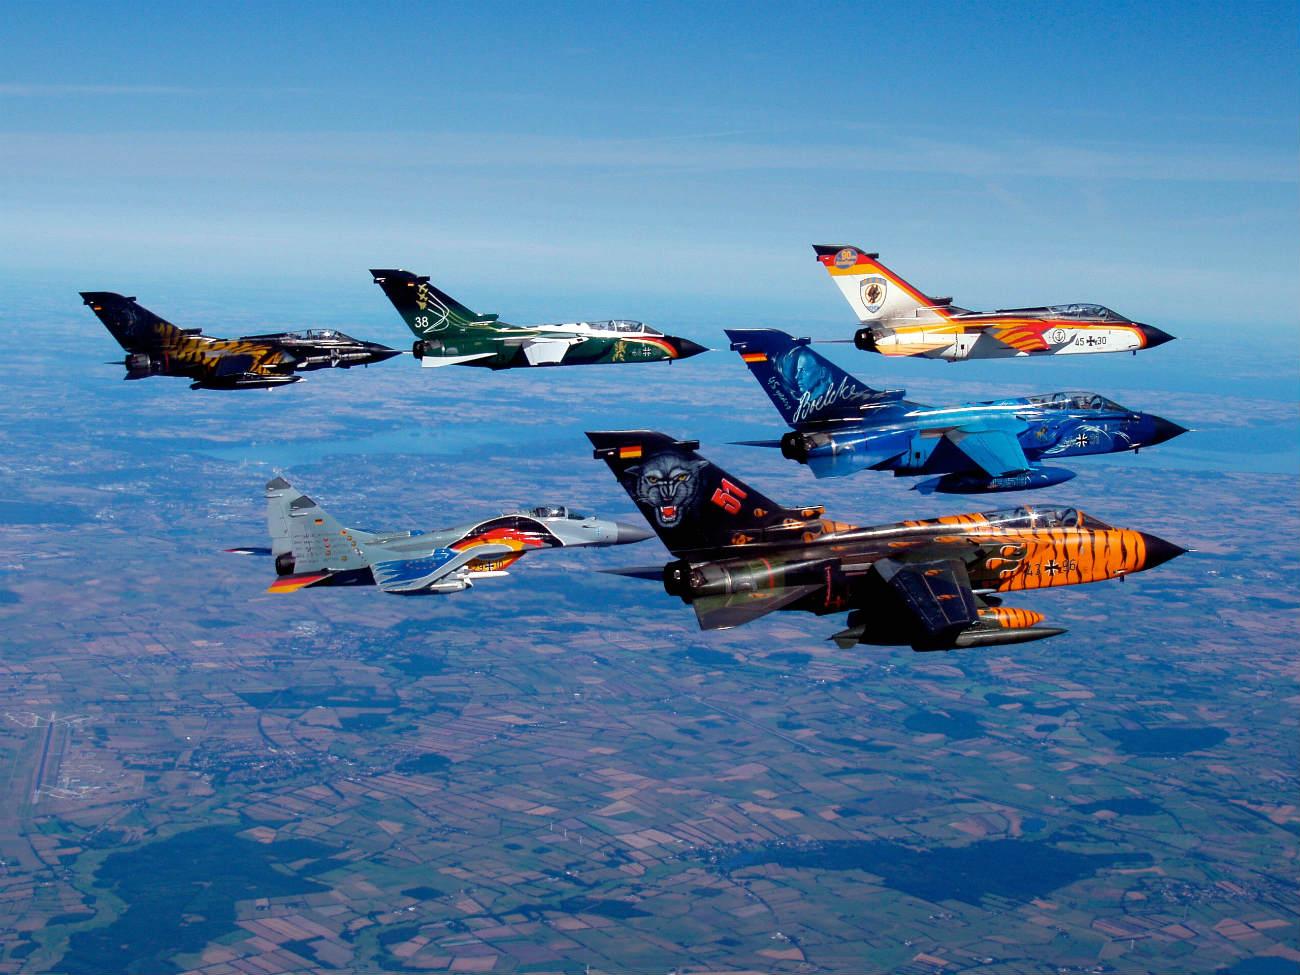 Captivating Images of Panavia Tornado formation flight